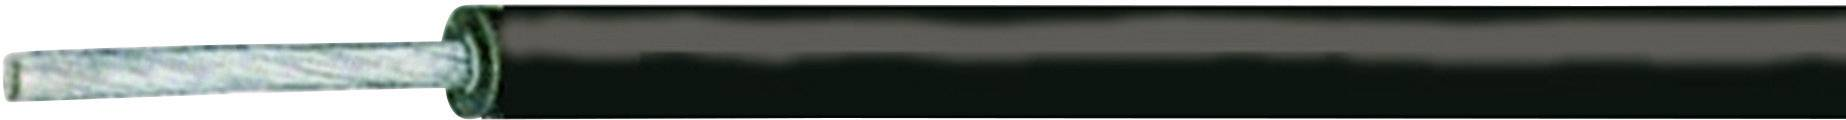 Stikalna žica SiL-SiAF 1 x 4 mm, bela XBK Kabel cena za meter